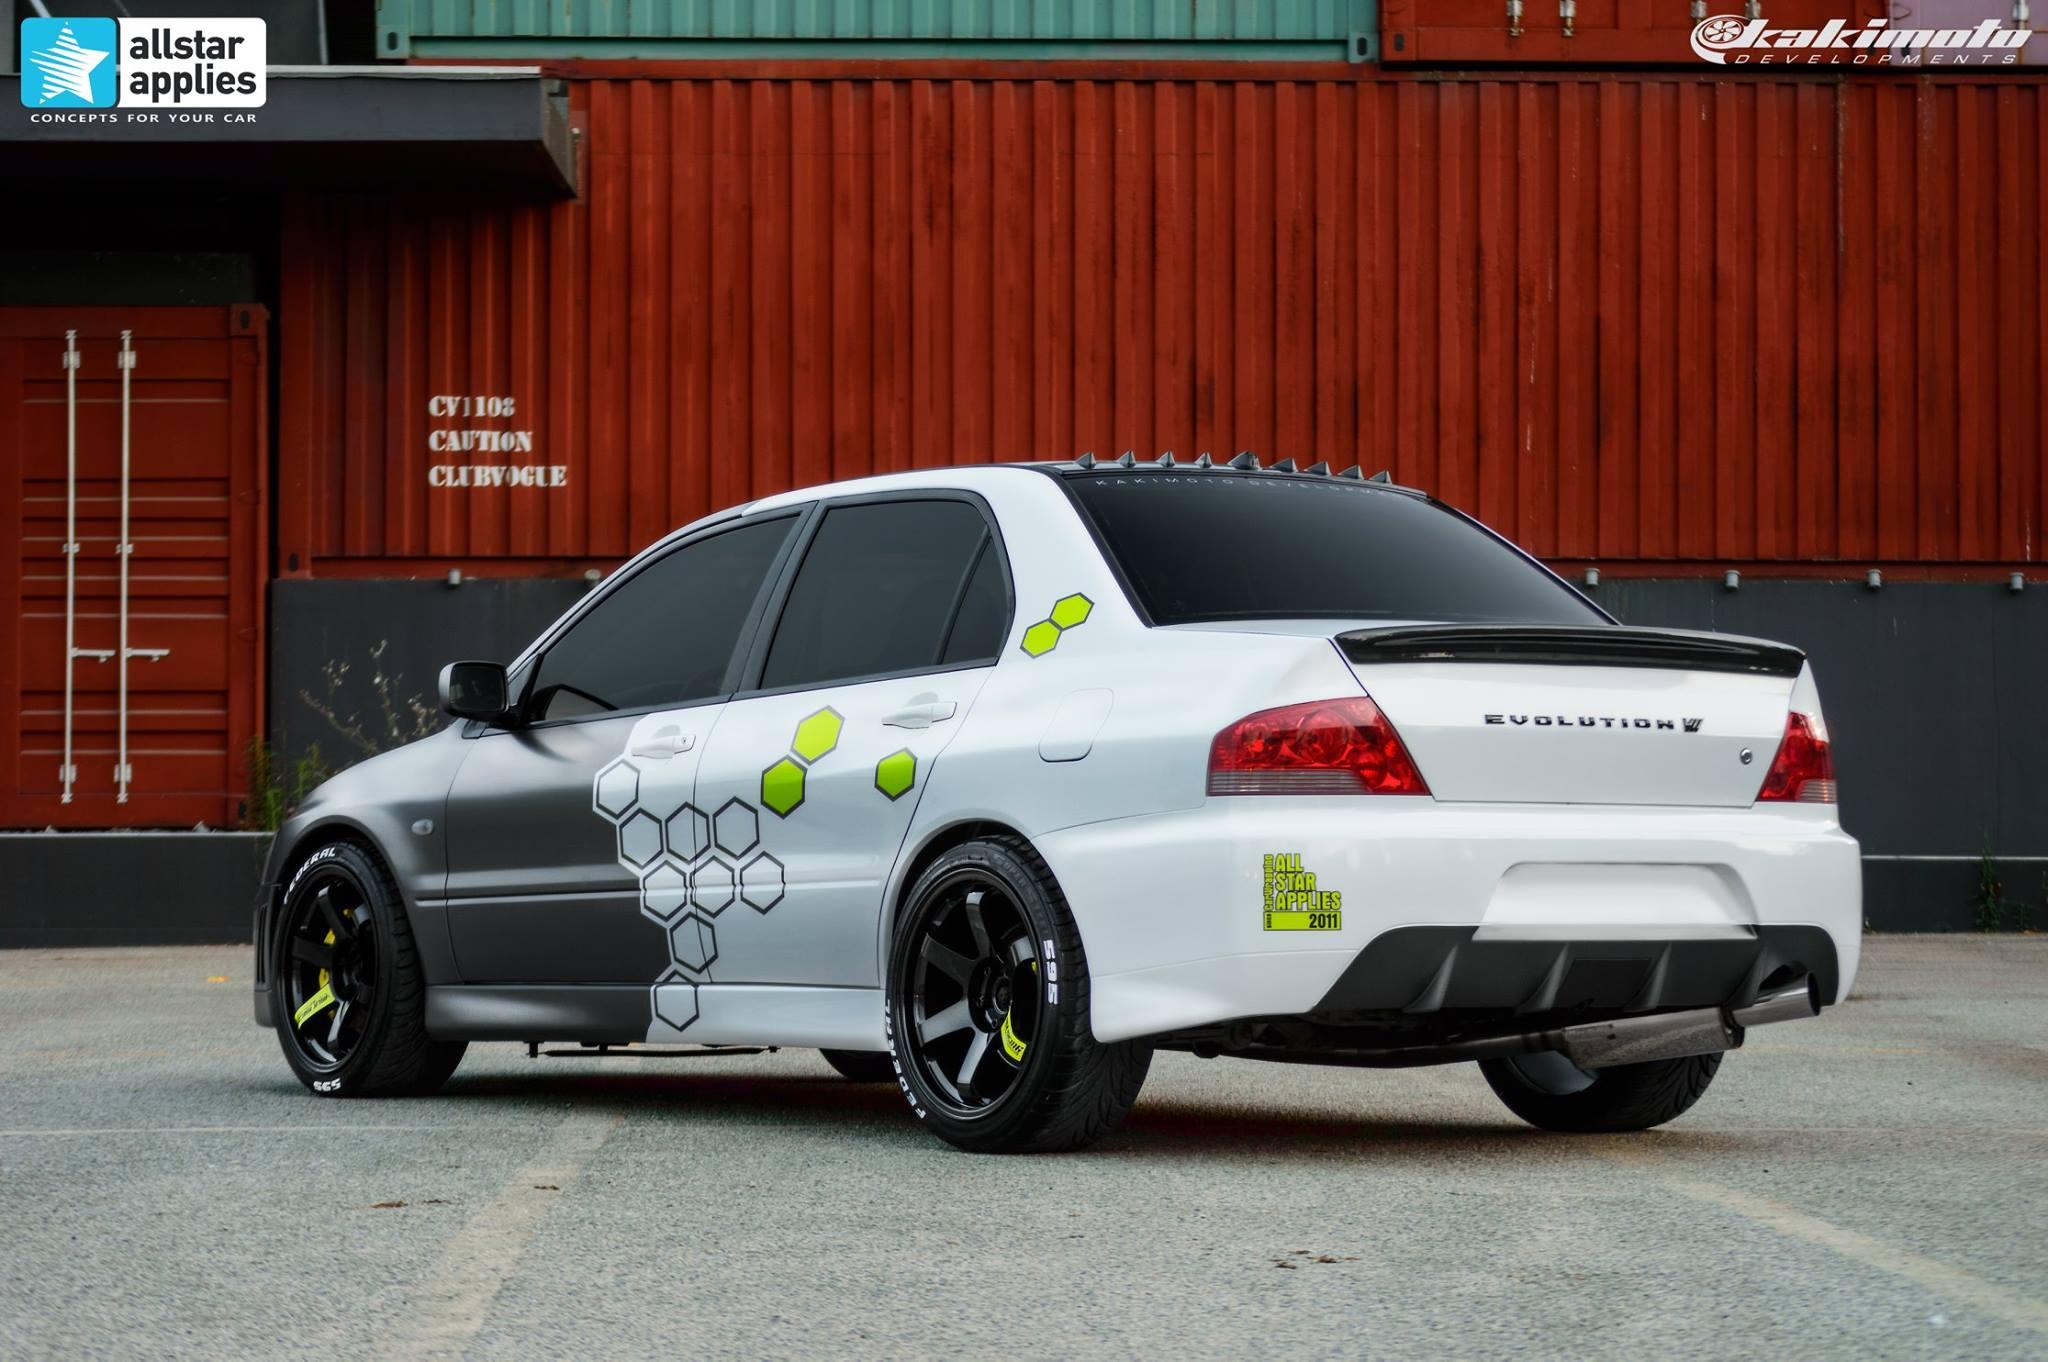 Mitsubishi Evo 7 - Honeycomb Design (2)